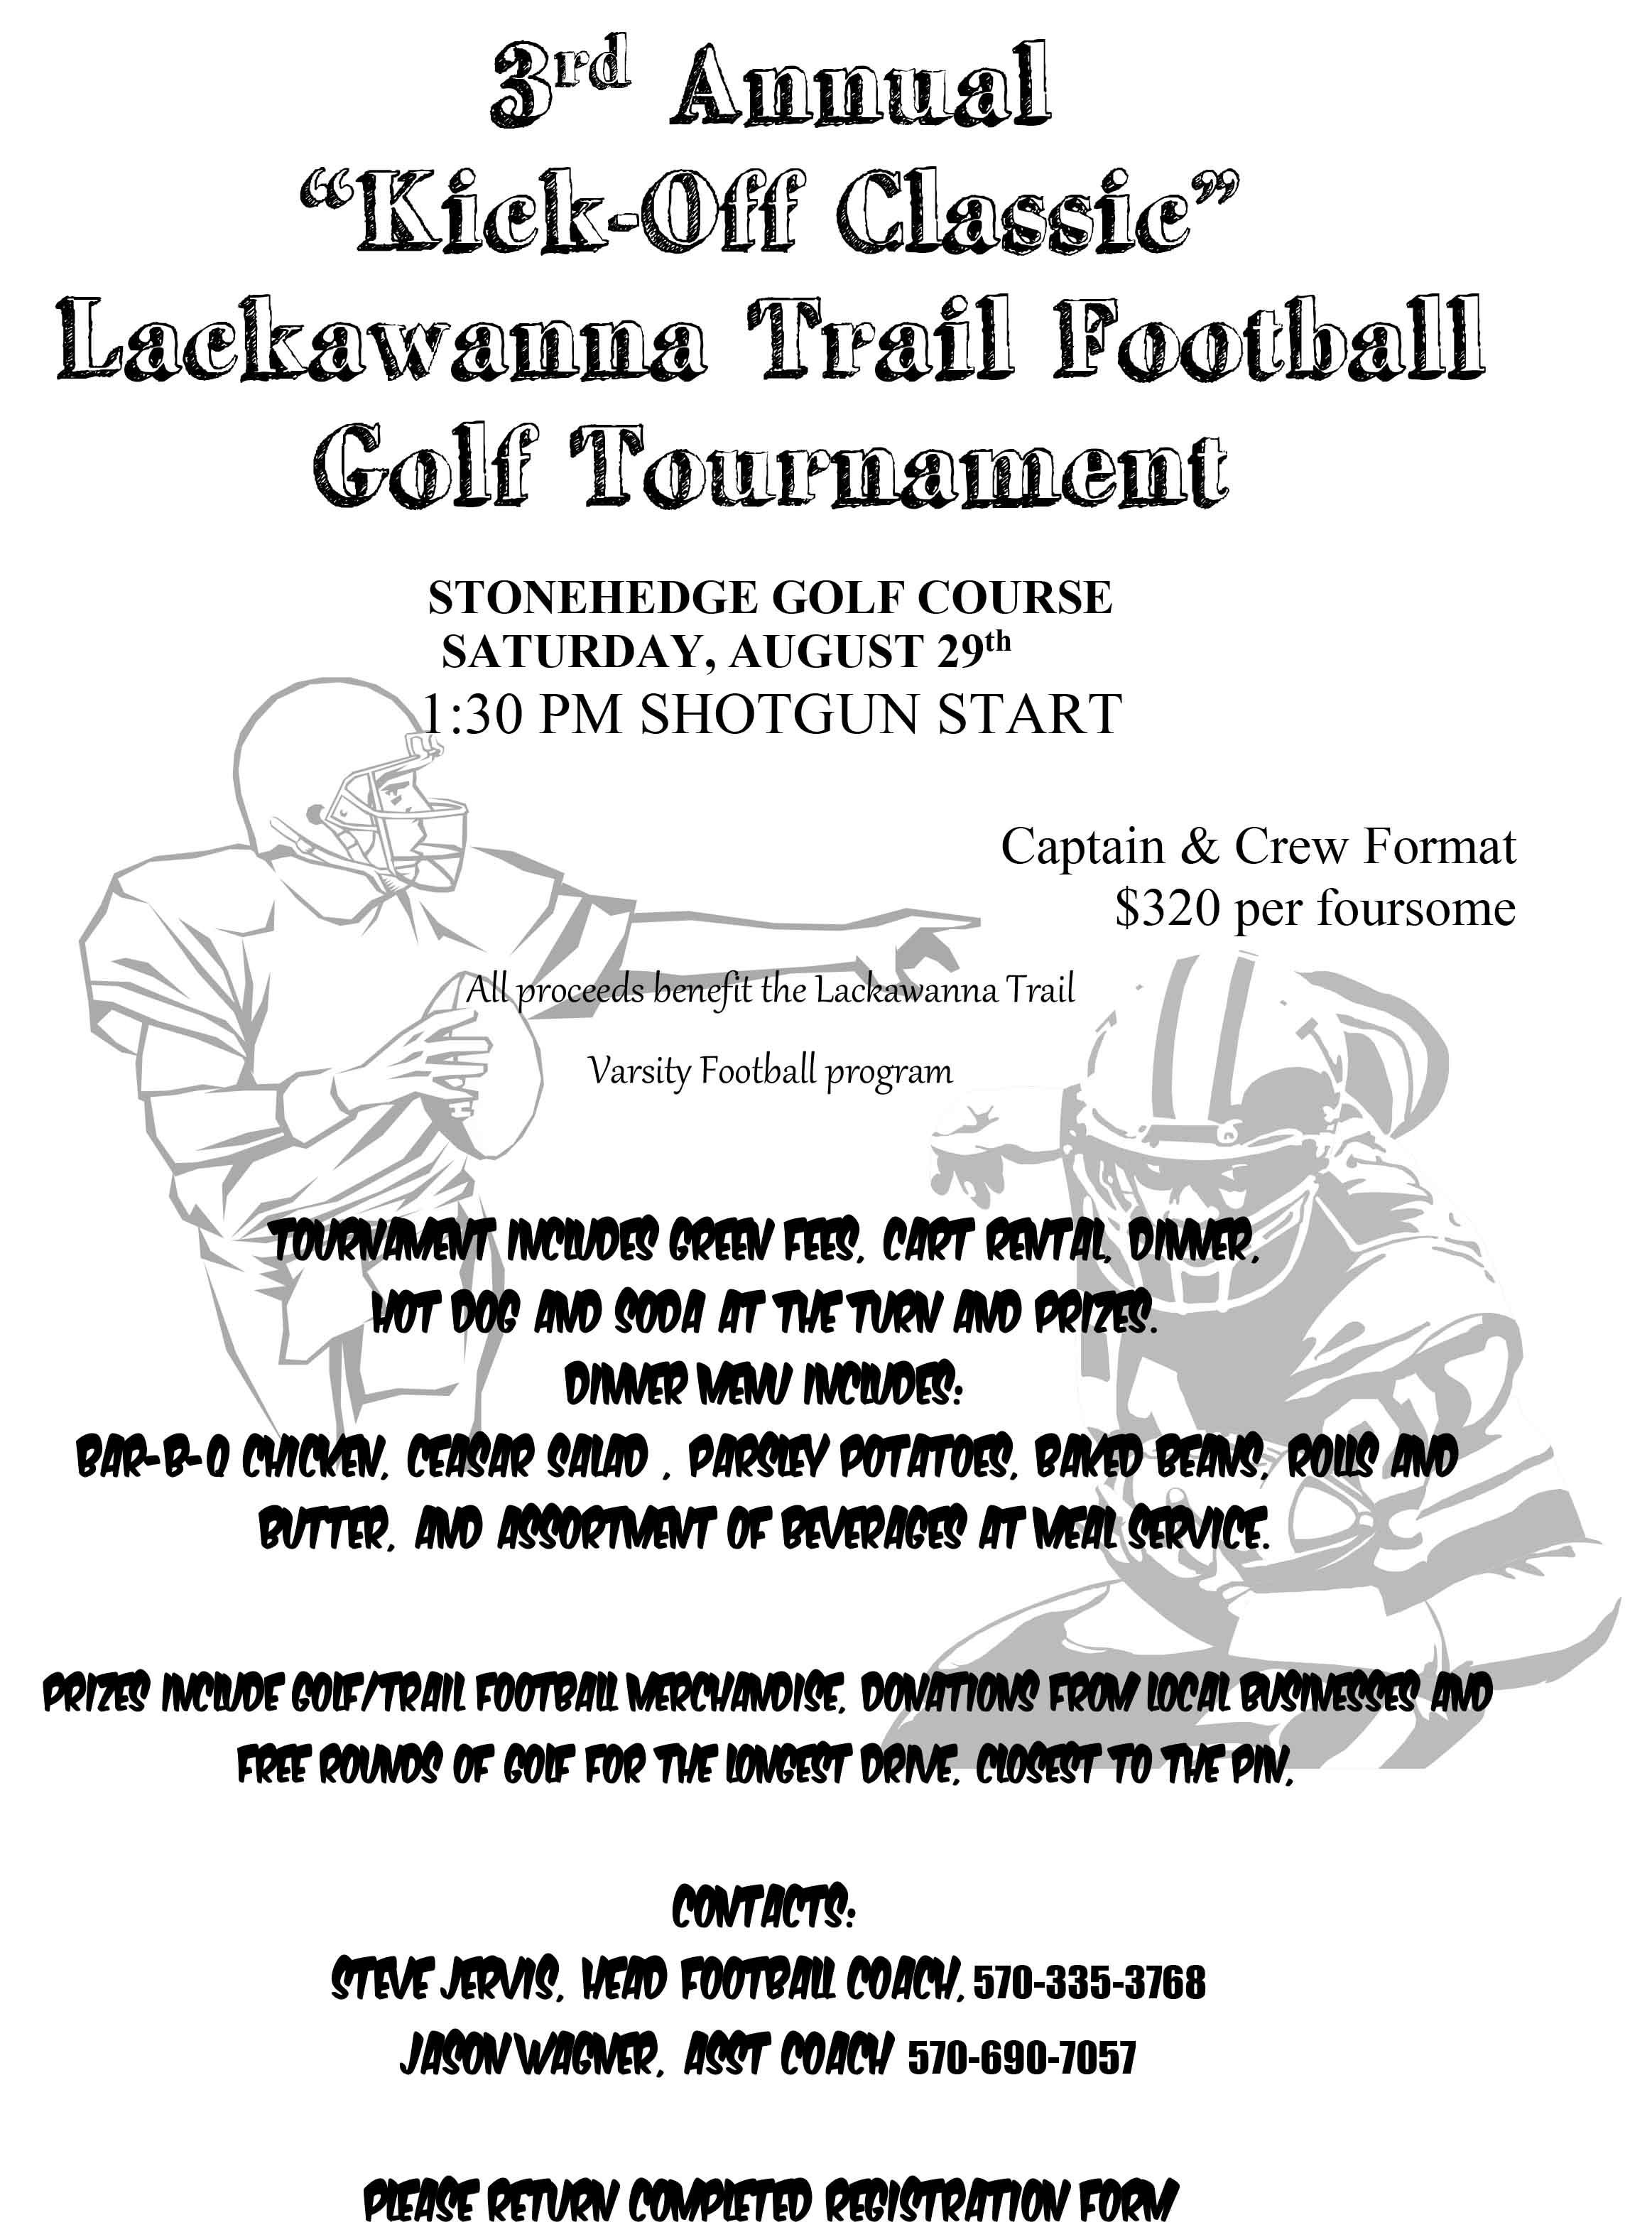 Microsoft Word - LT Golf Tournament Flyer